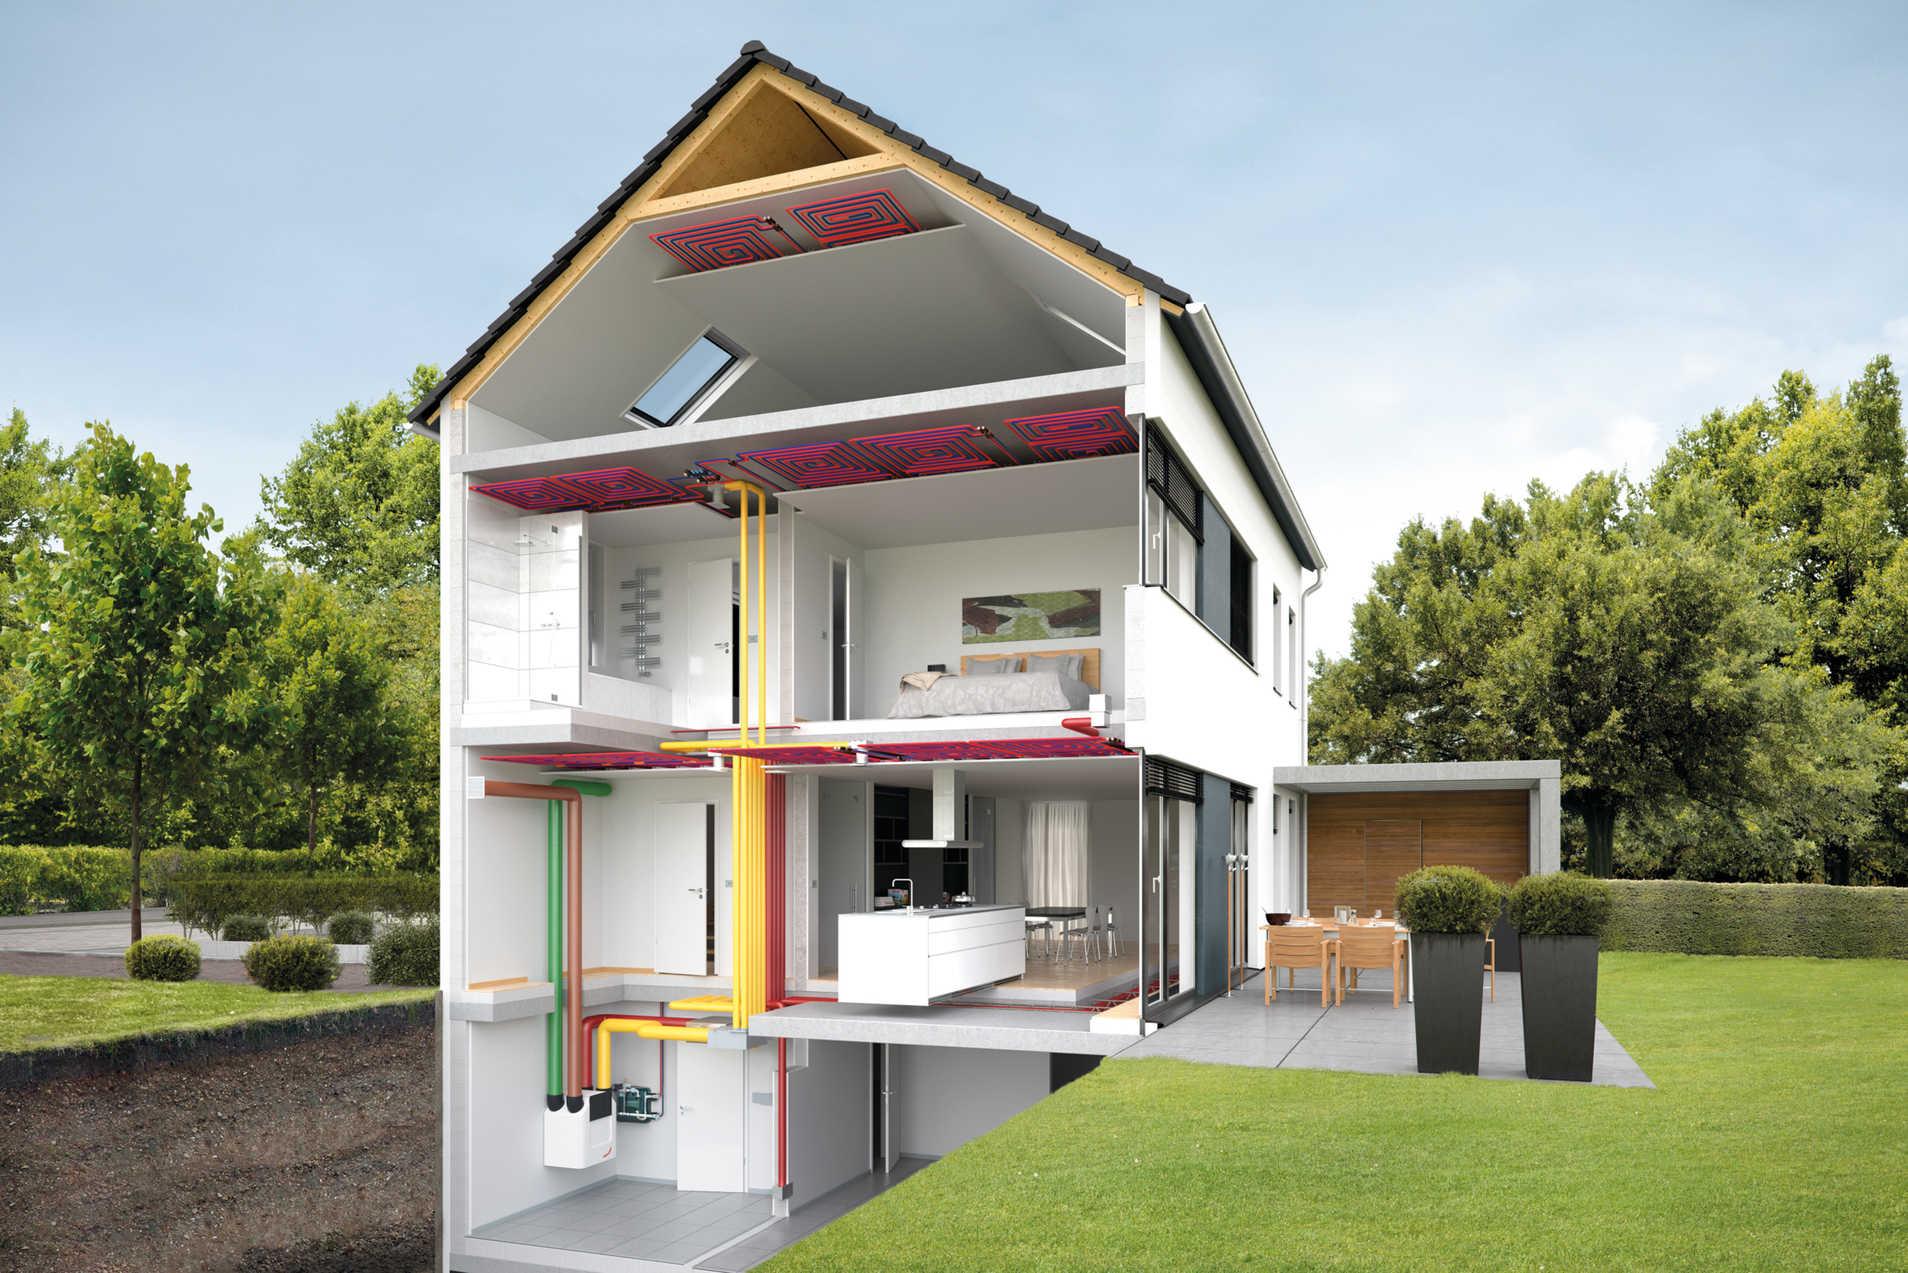 Ventilazione comfort per spazi abitativi zehnder group italia s r l - Tubi a vista in casa ...